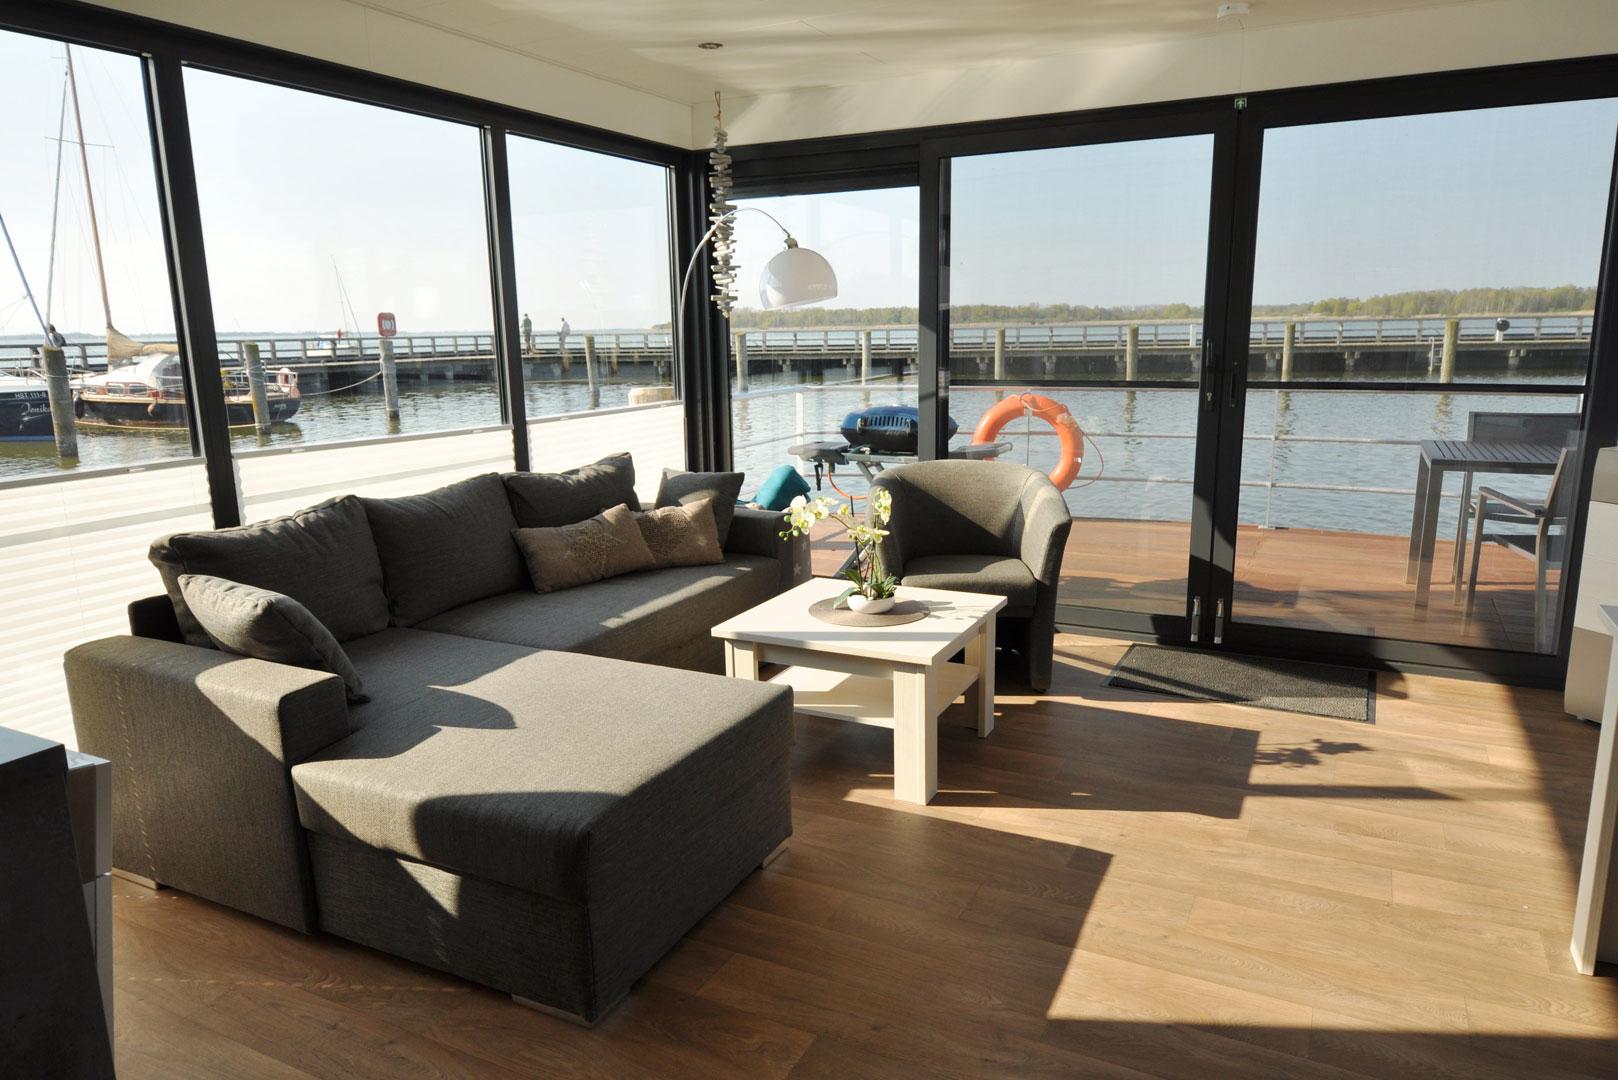 hausboot mieten an der ostsee darss ribnitz damgarten aktivurlaub. Black Bedroom Furniture Sets. Home Design Ideas